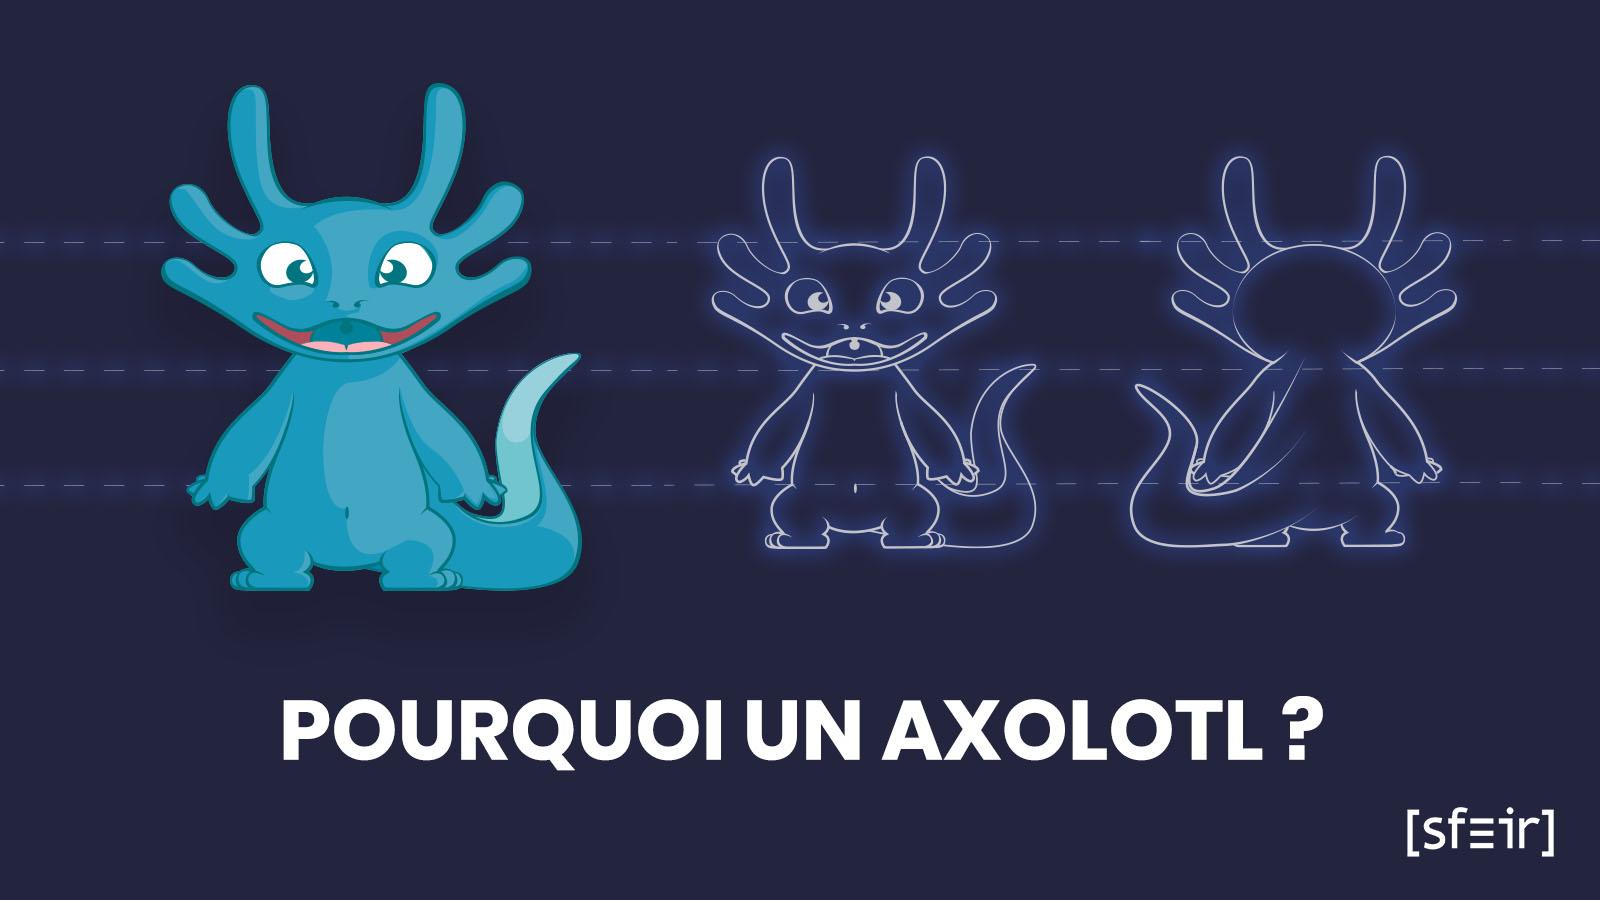 Mascotte SFEIR : Pourquoi avoir choisi un axolotl ?